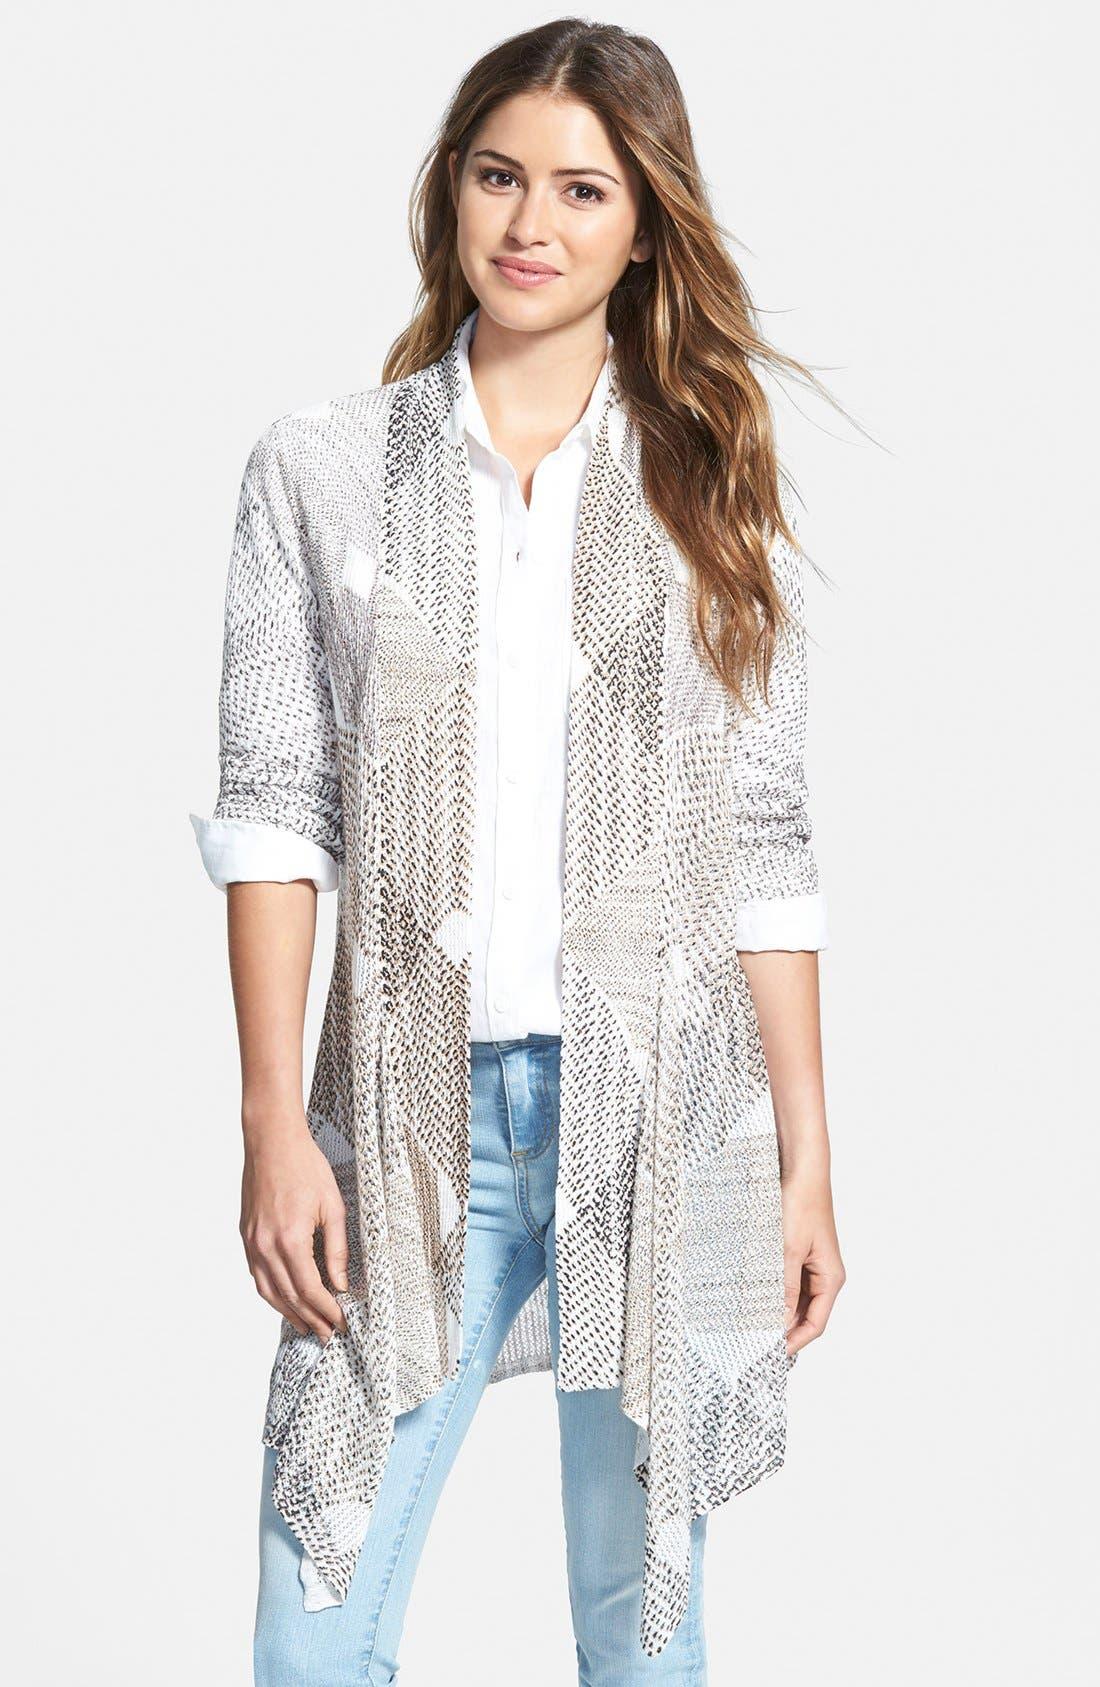 Alternate Image 1 Selected - NIC+ZOE 'Dashed Diamonds' Long Cardigan (Regular & Petite)